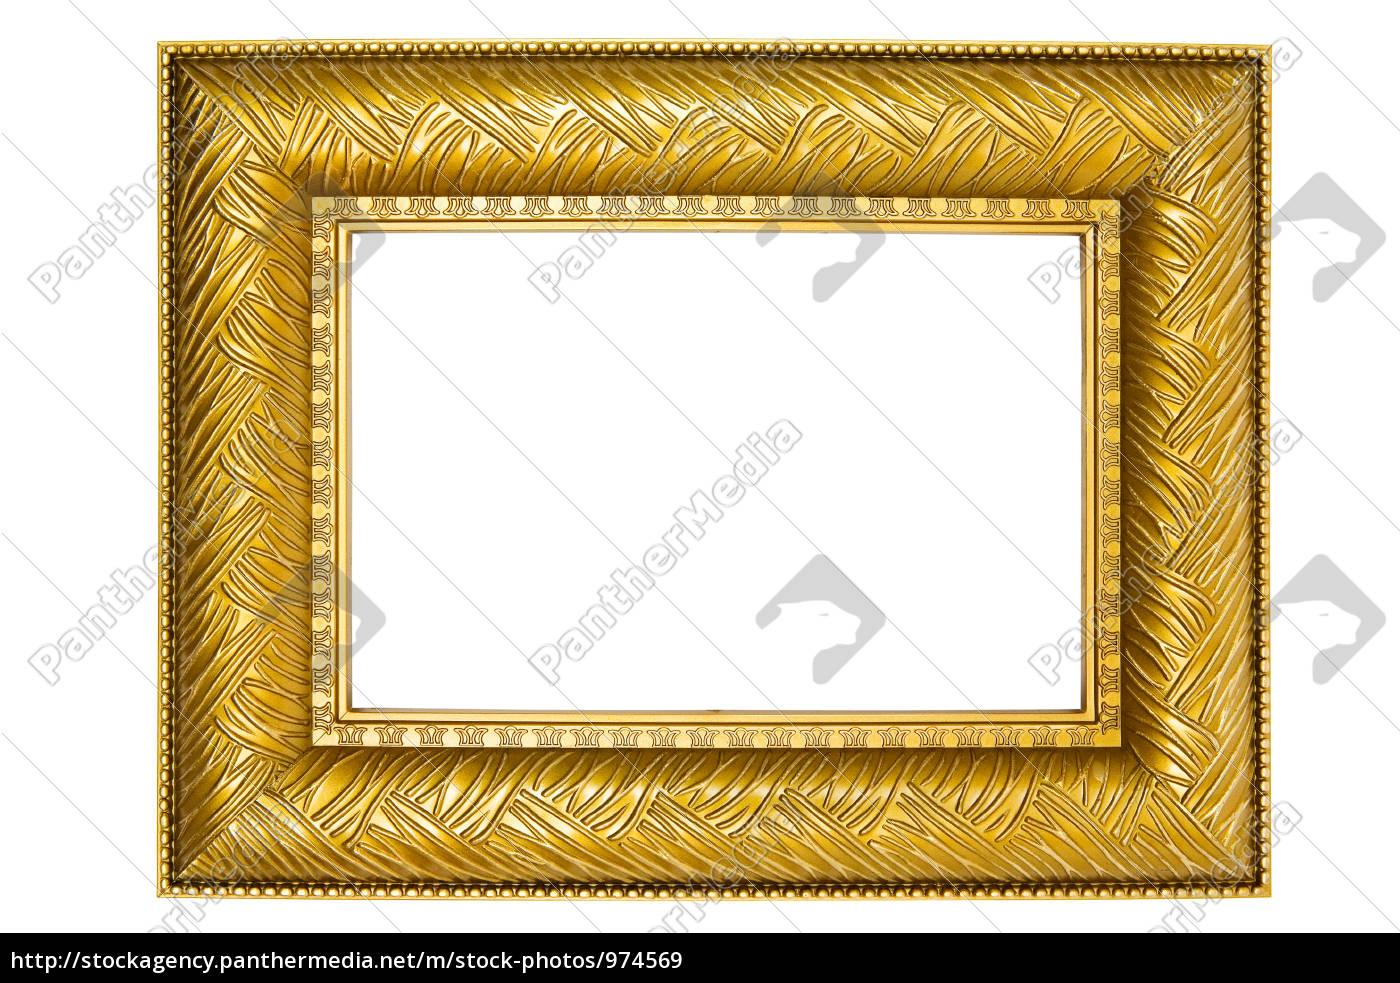 goldener bilderrahmen mit verzierungen lizenzfreies bild 974569 bildagentur panthermedia. Black Bedroom Furniture Sets. Home Design Ideas